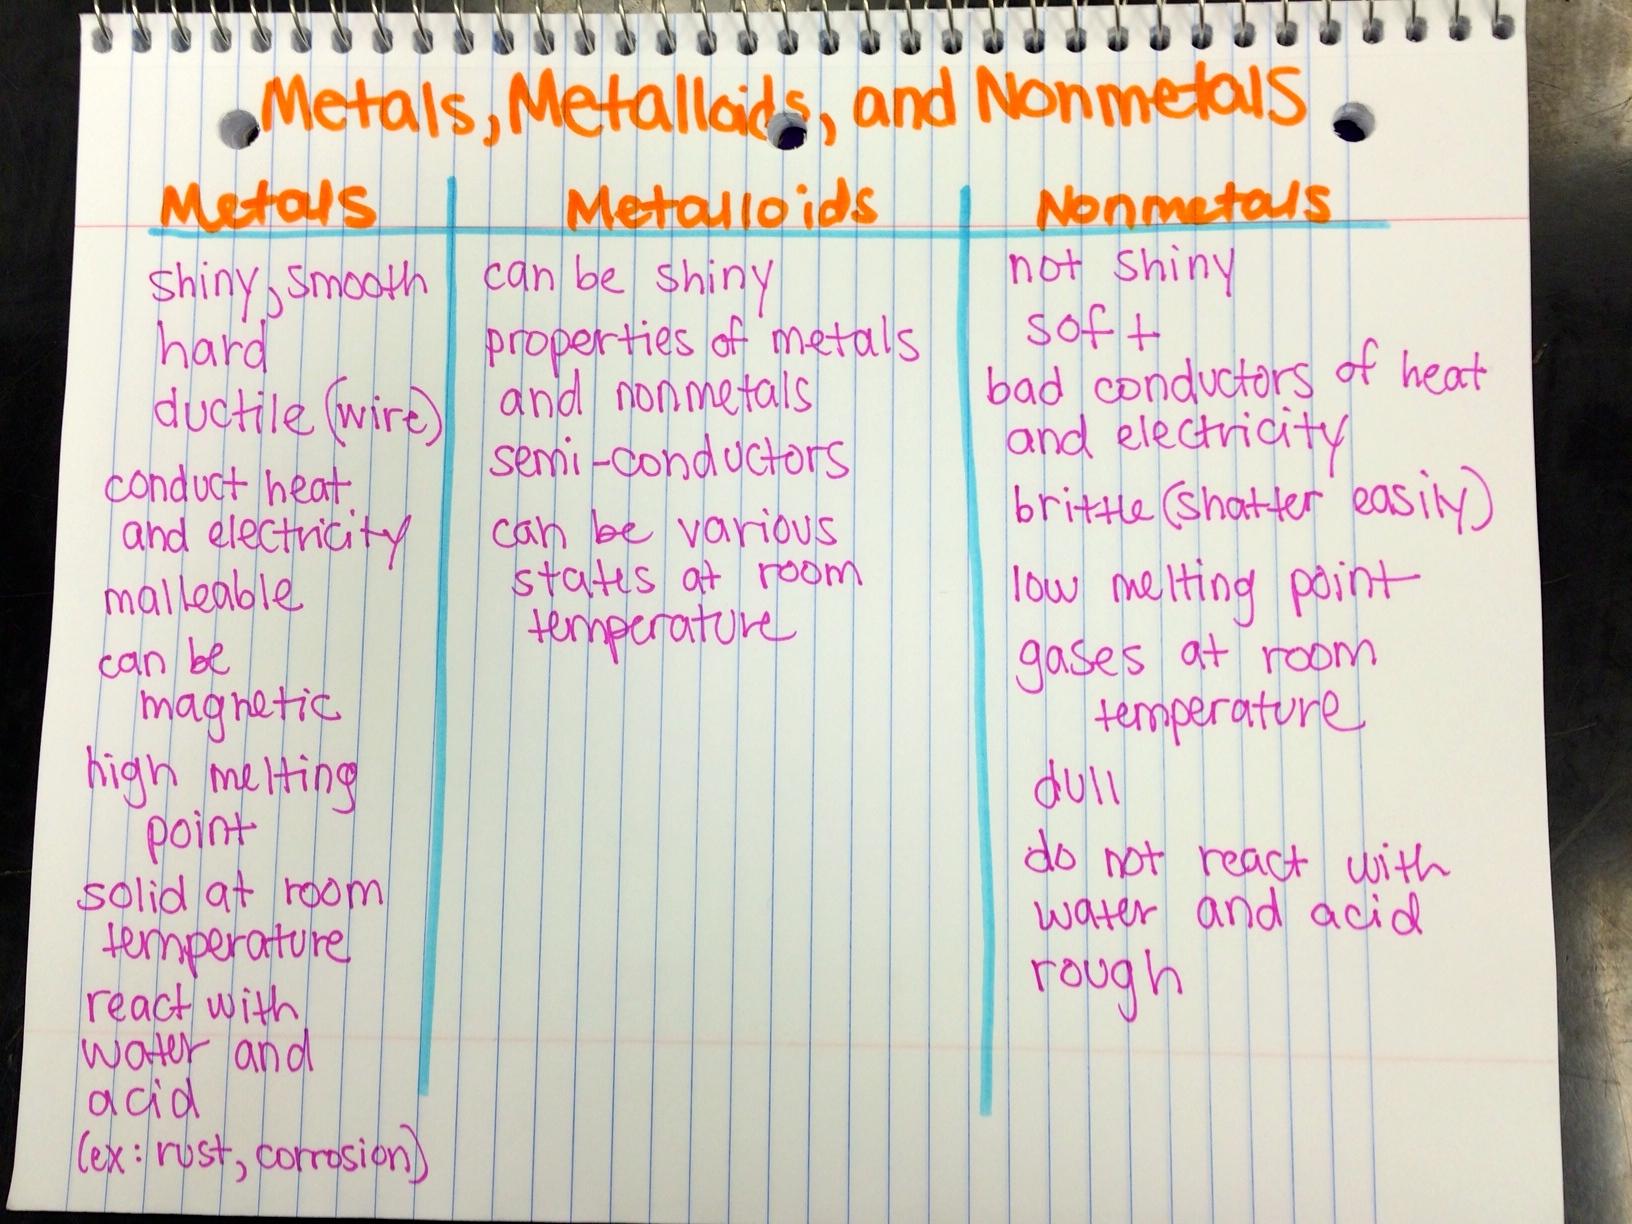 Properties of Metals, Metalloids, and Nonmetals | Ms ...